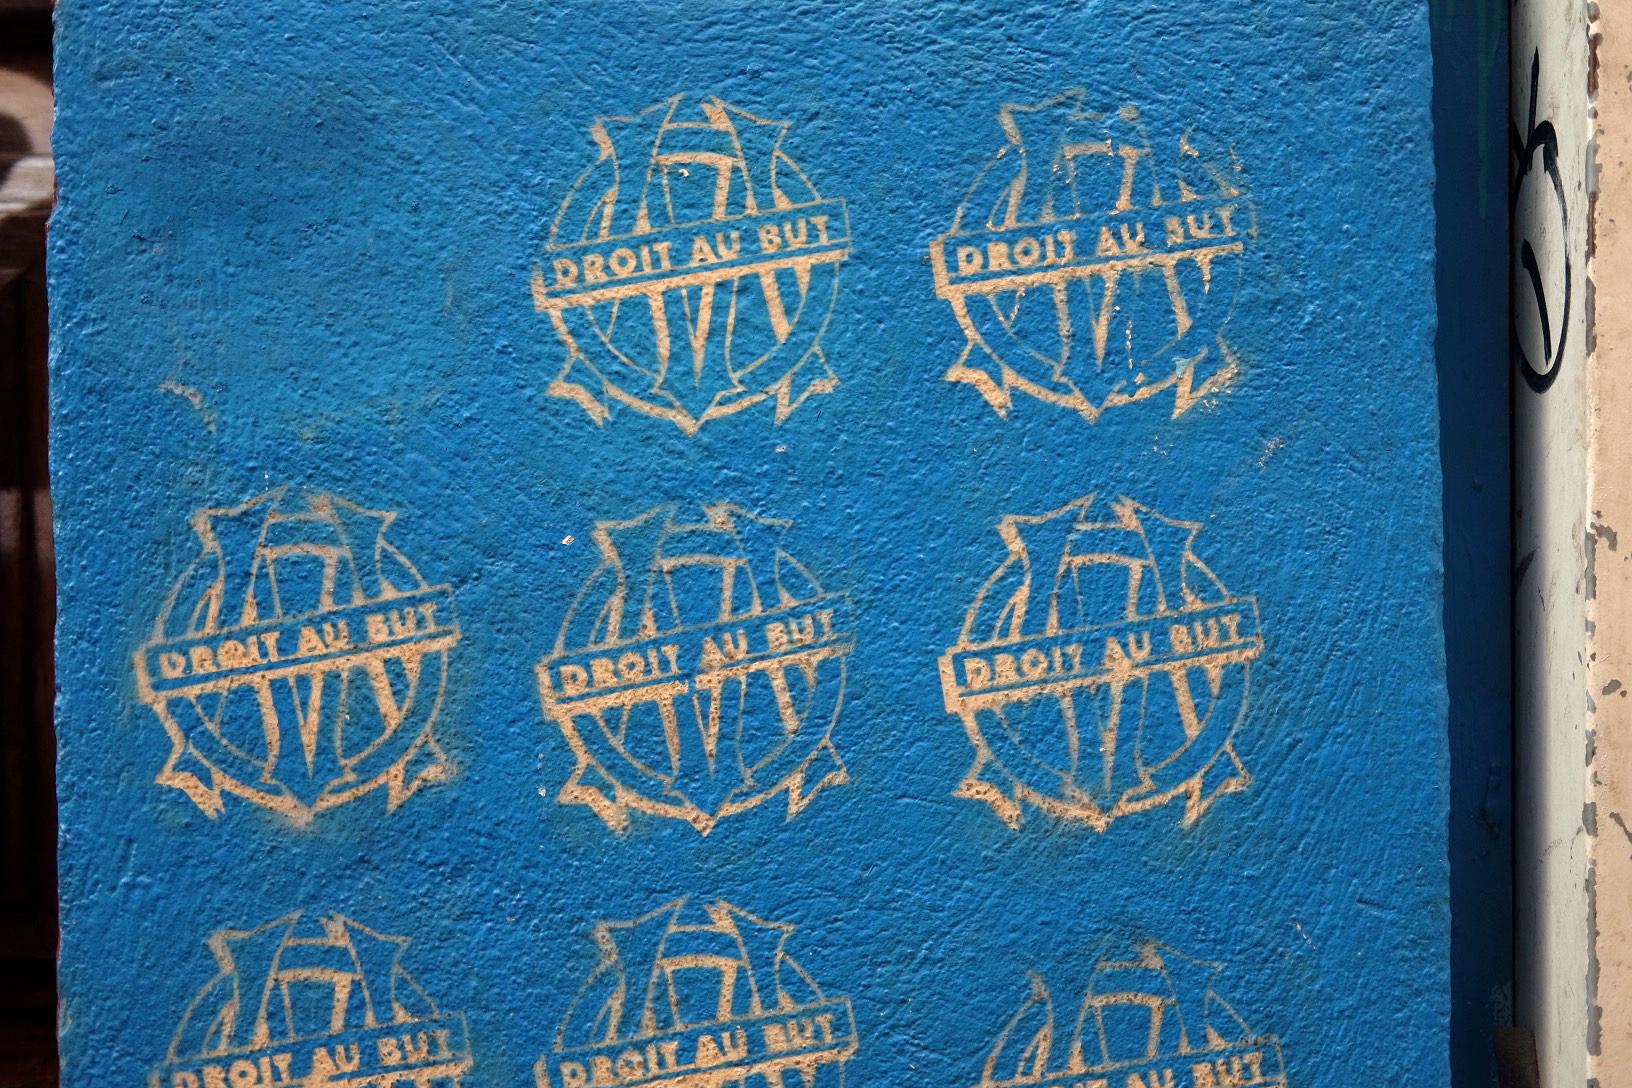 Olympique de Marseille street tags. (Photo by Pauline Eiferman)